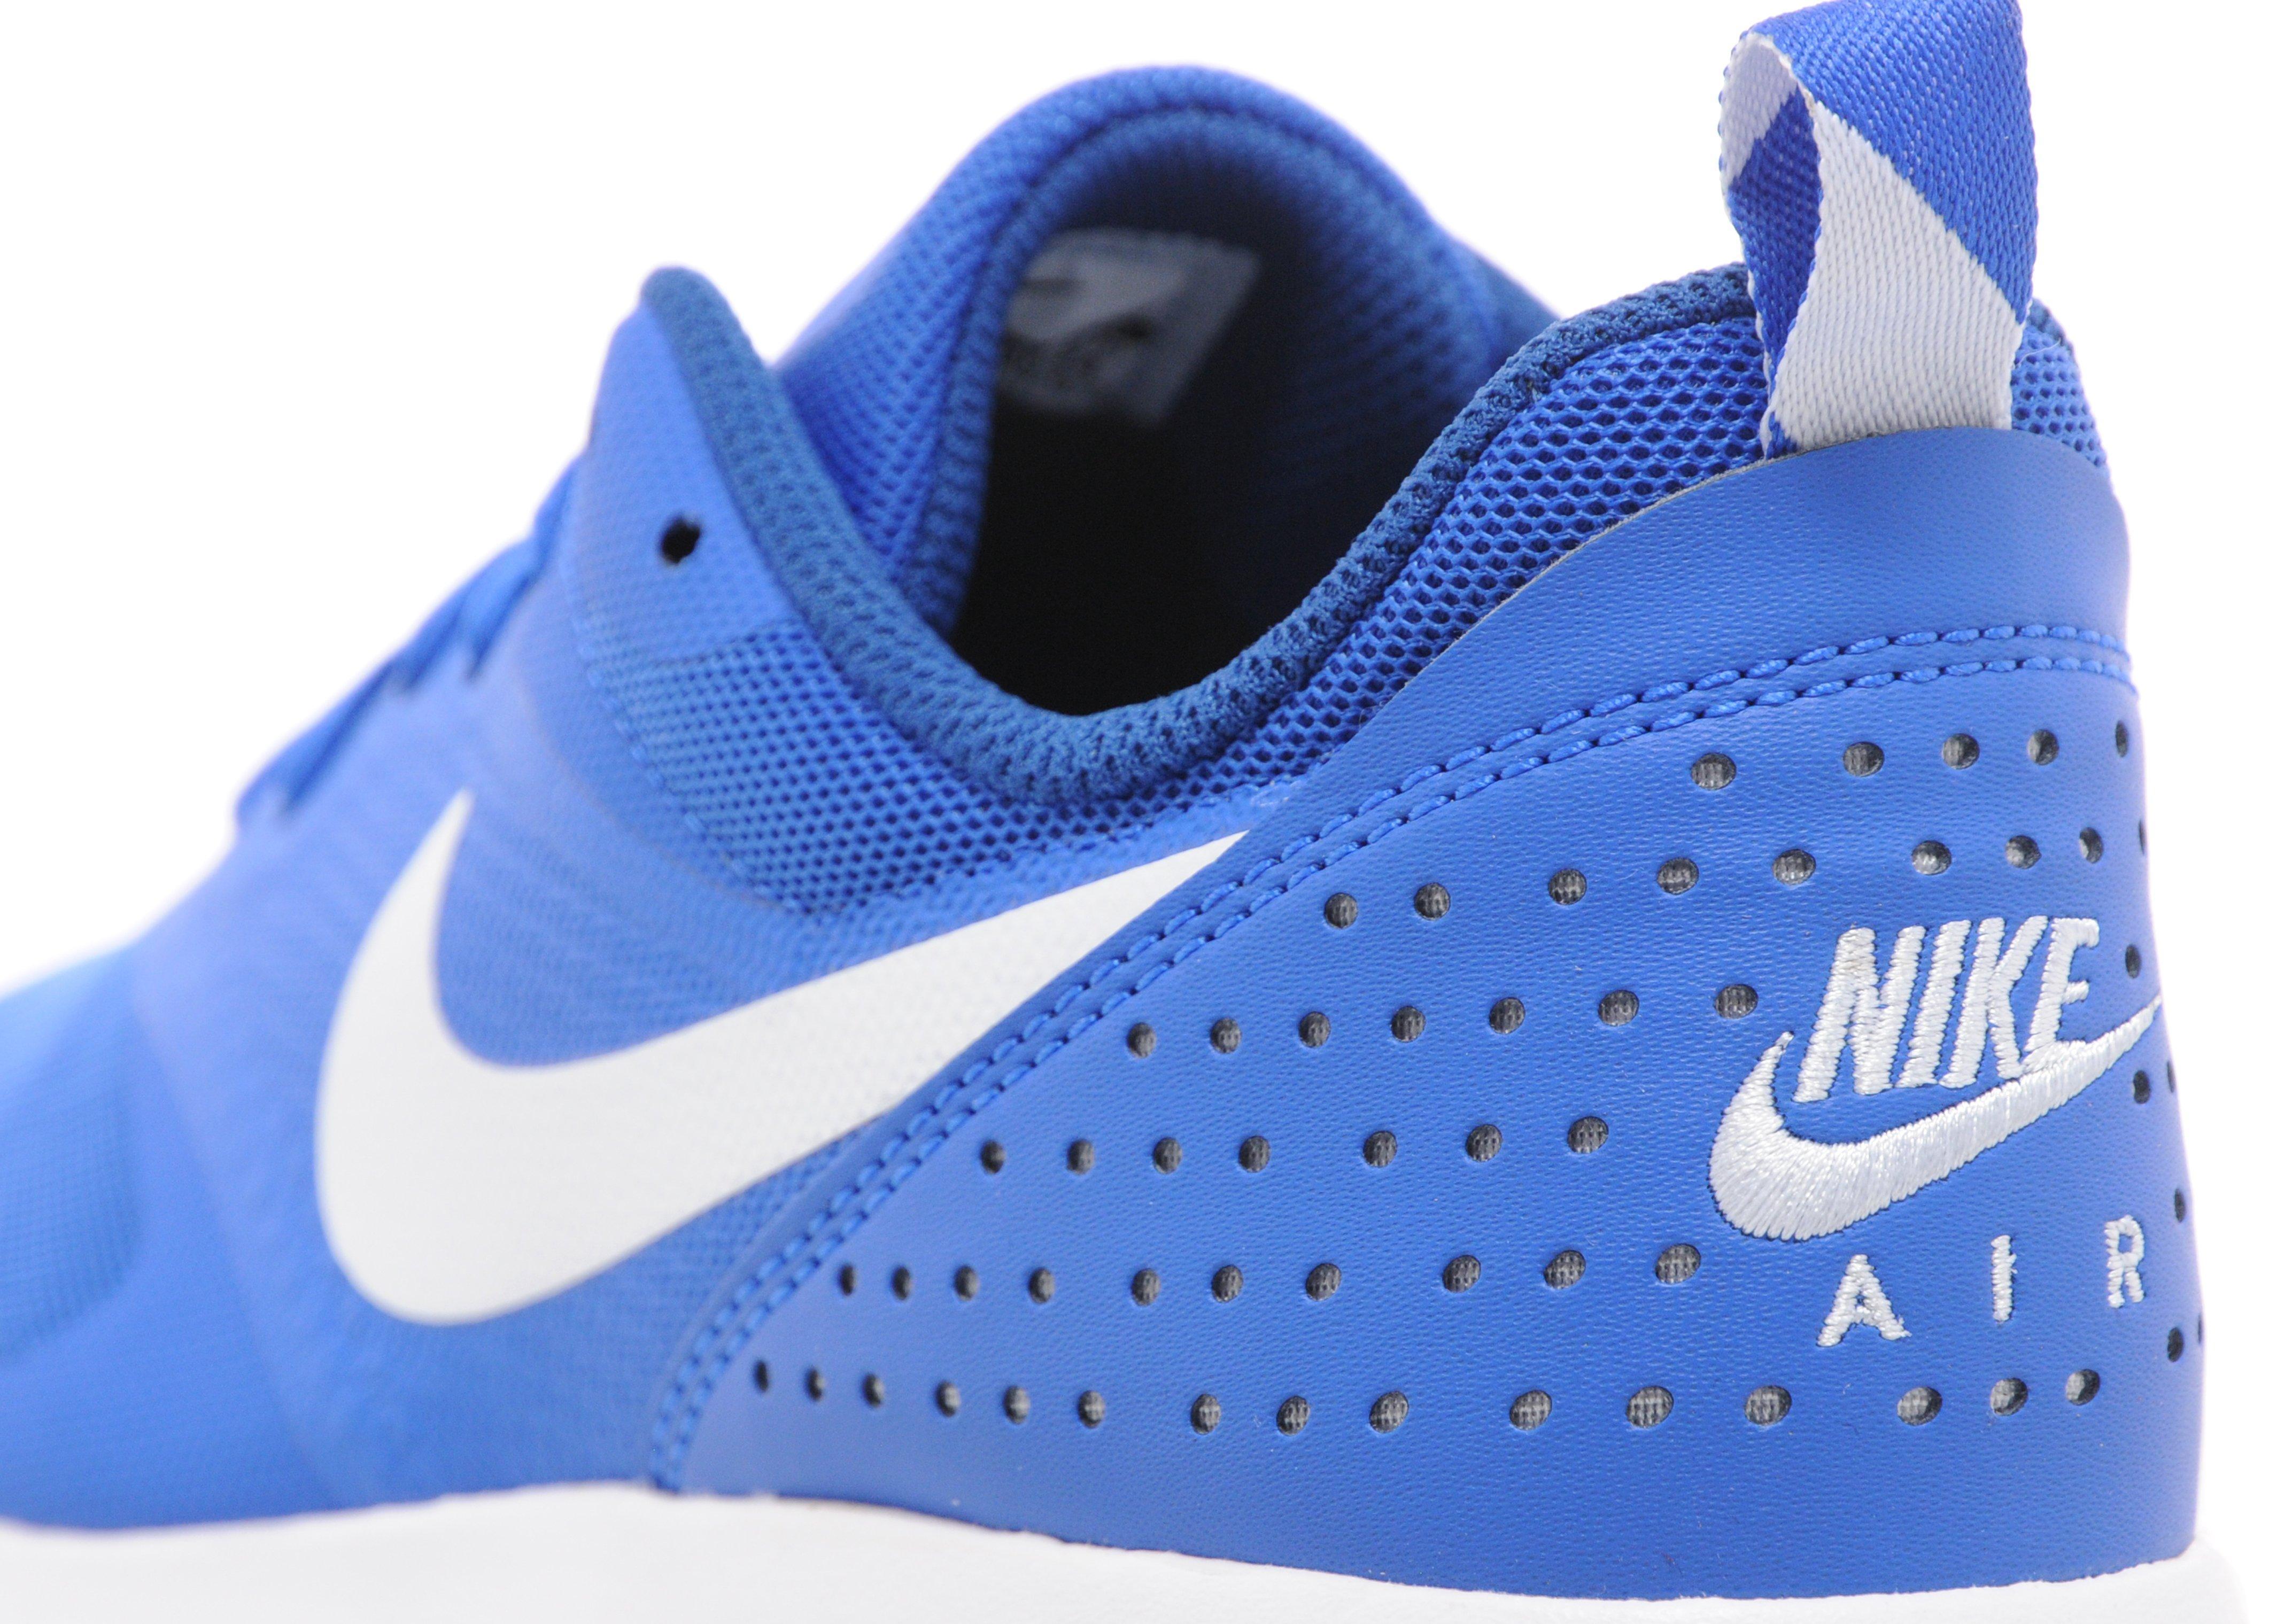 Nike Air Max Tavas Blue